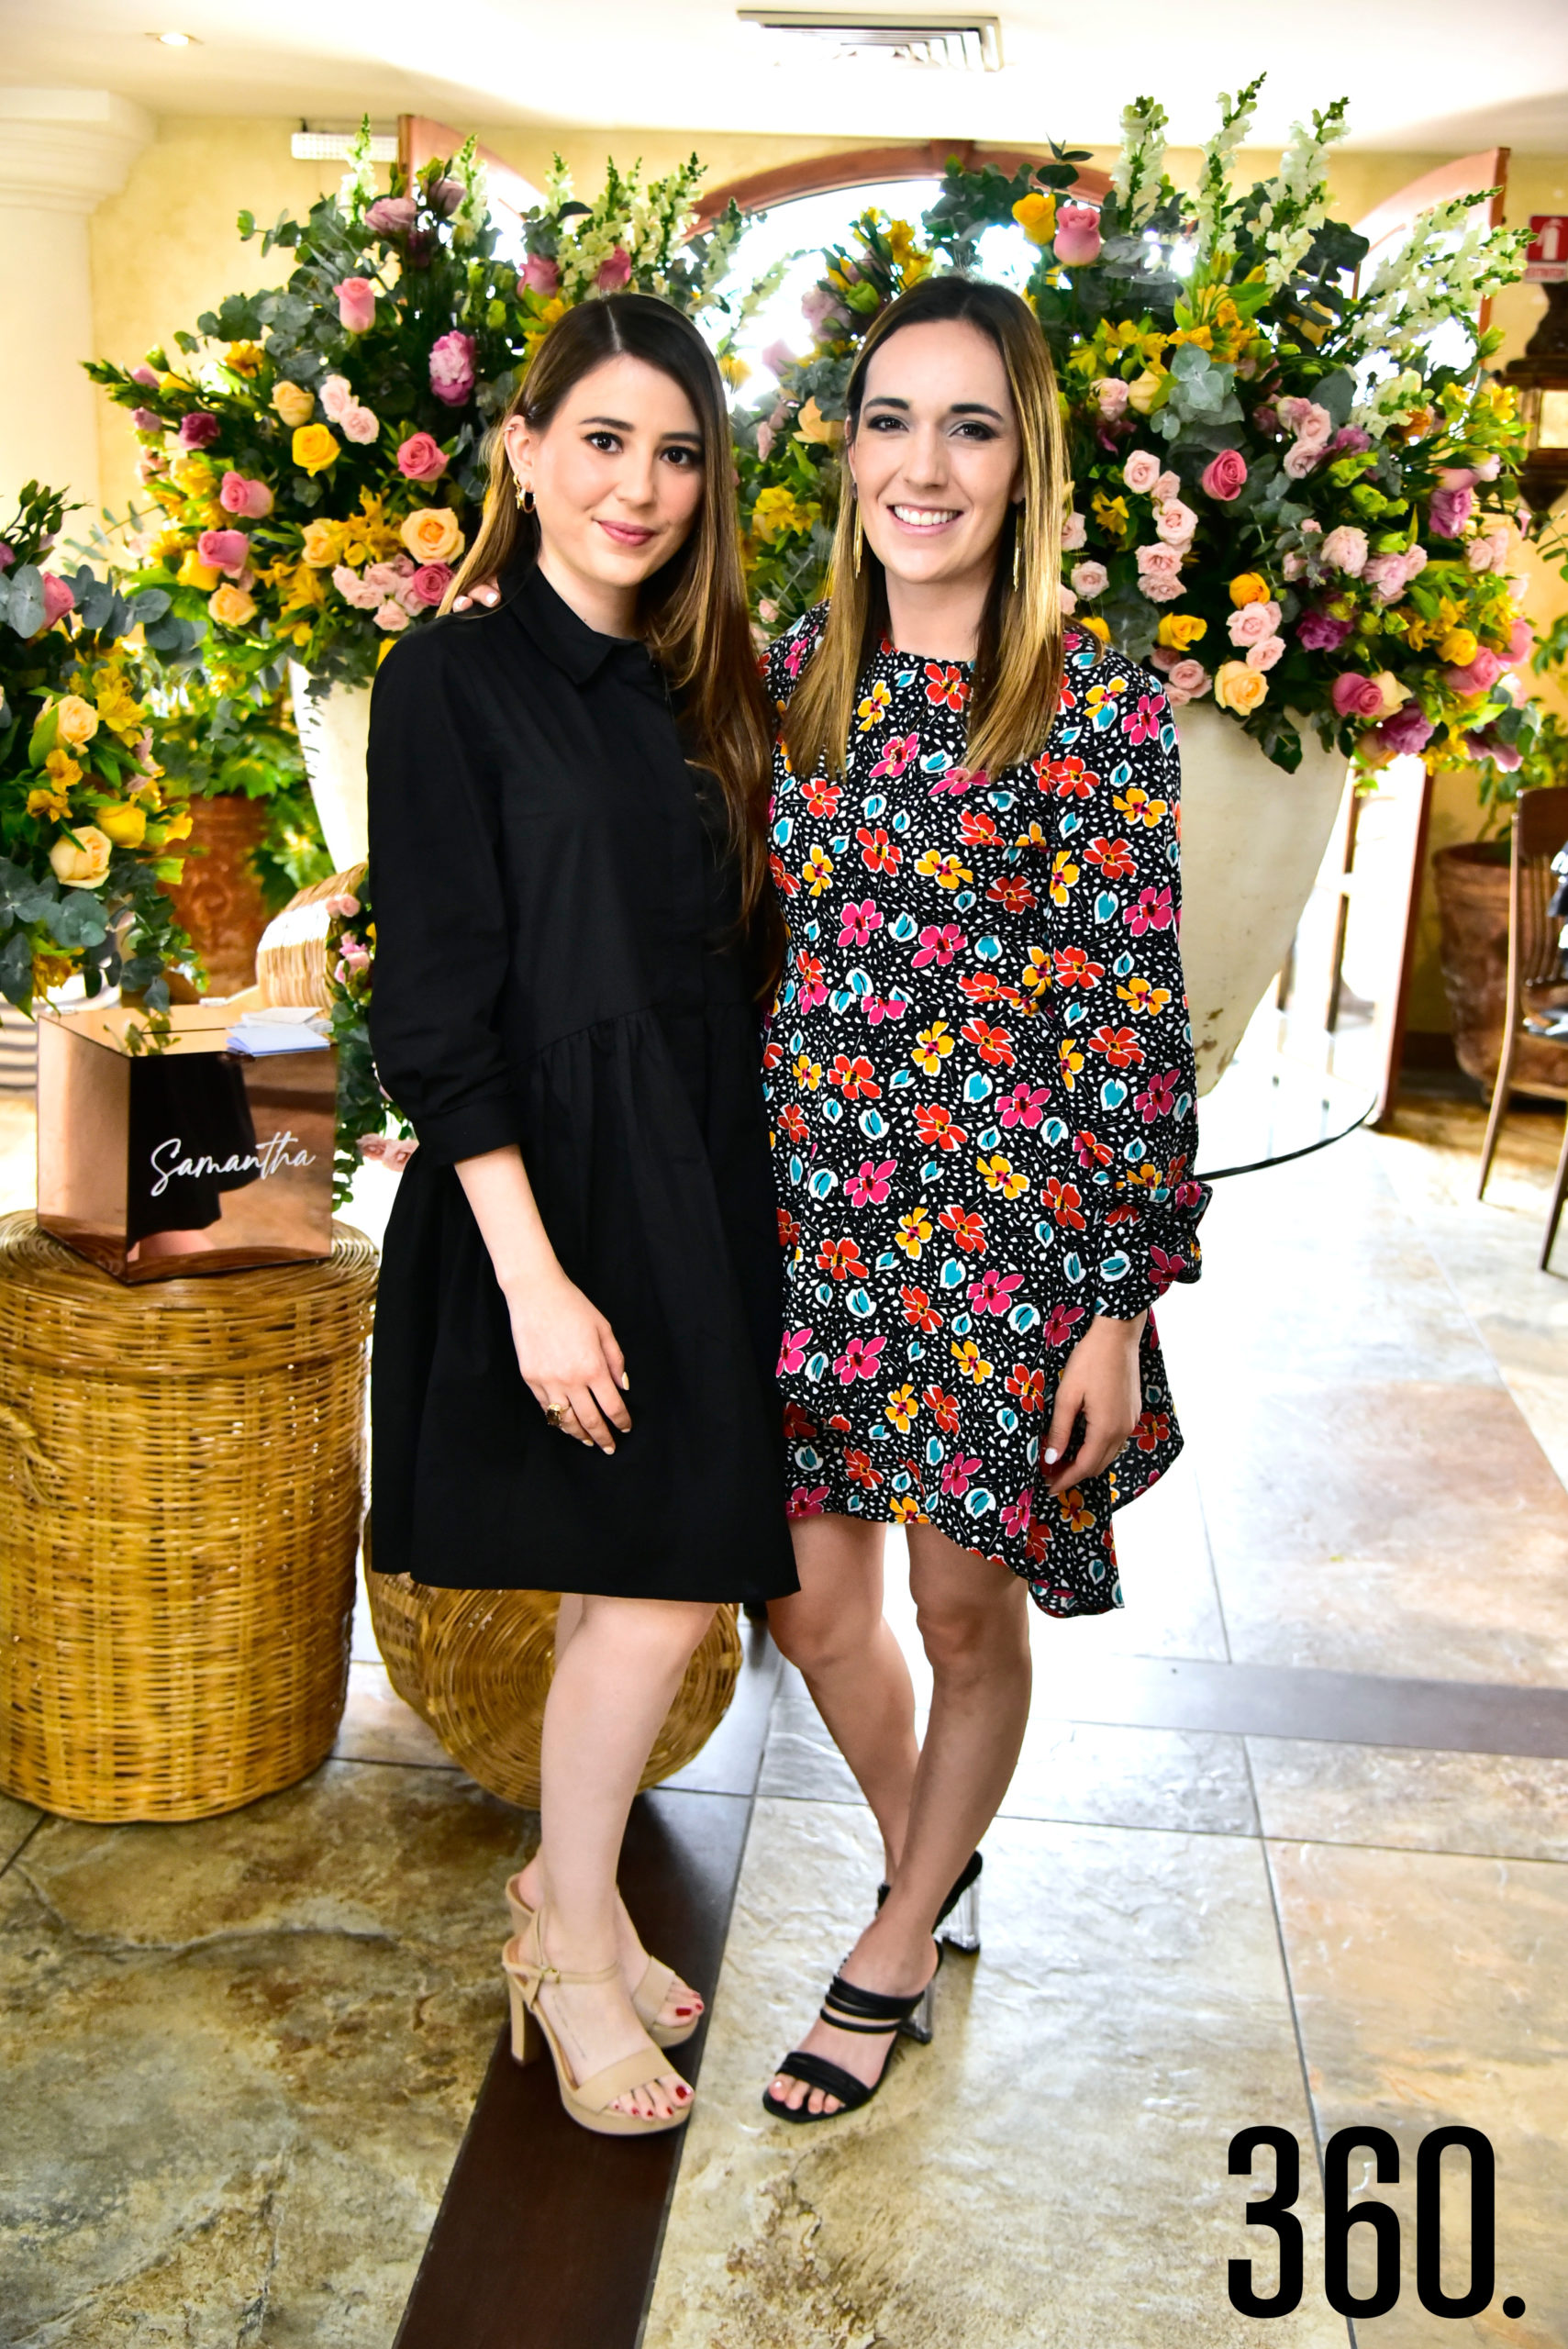 Maricarmen Rodríguez y Ana Lucia Rodríguez.